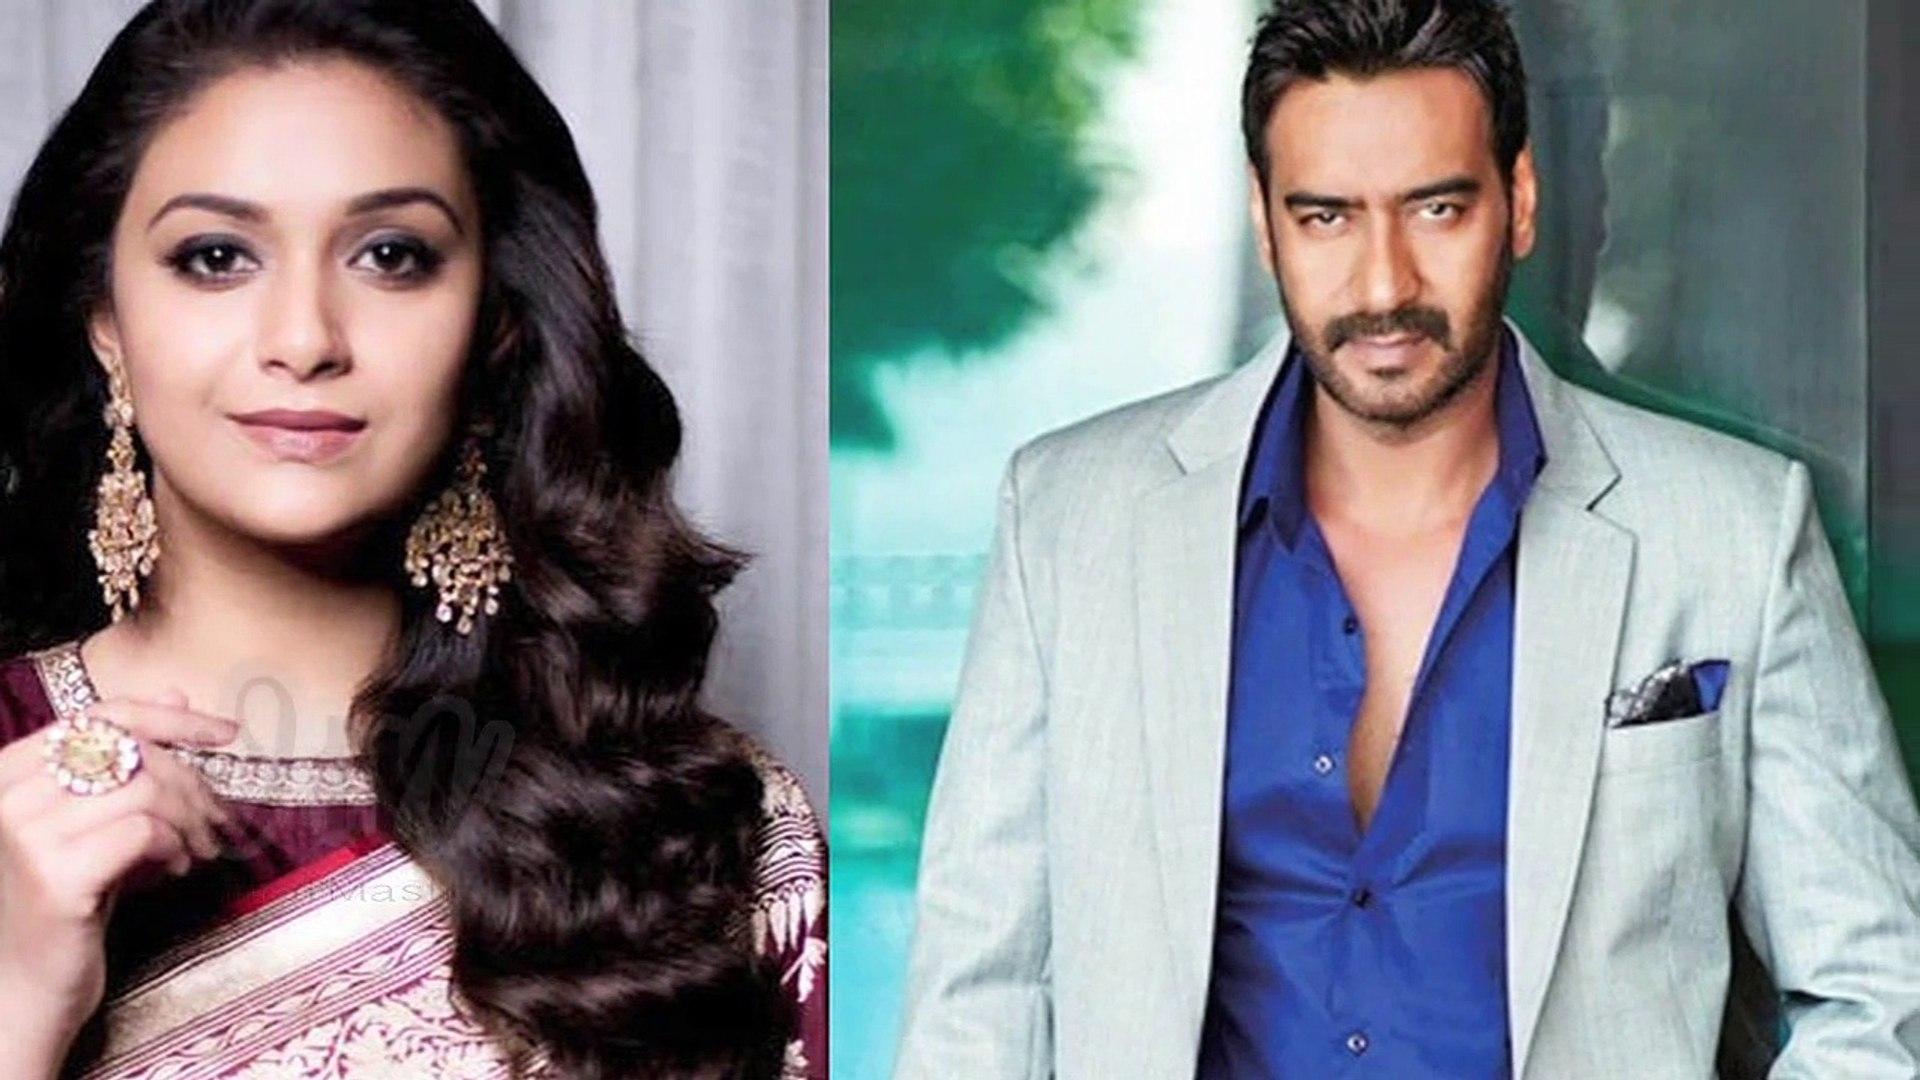 Keerthy Suresh to make her Bollywood debut in Ajay Devgn's film